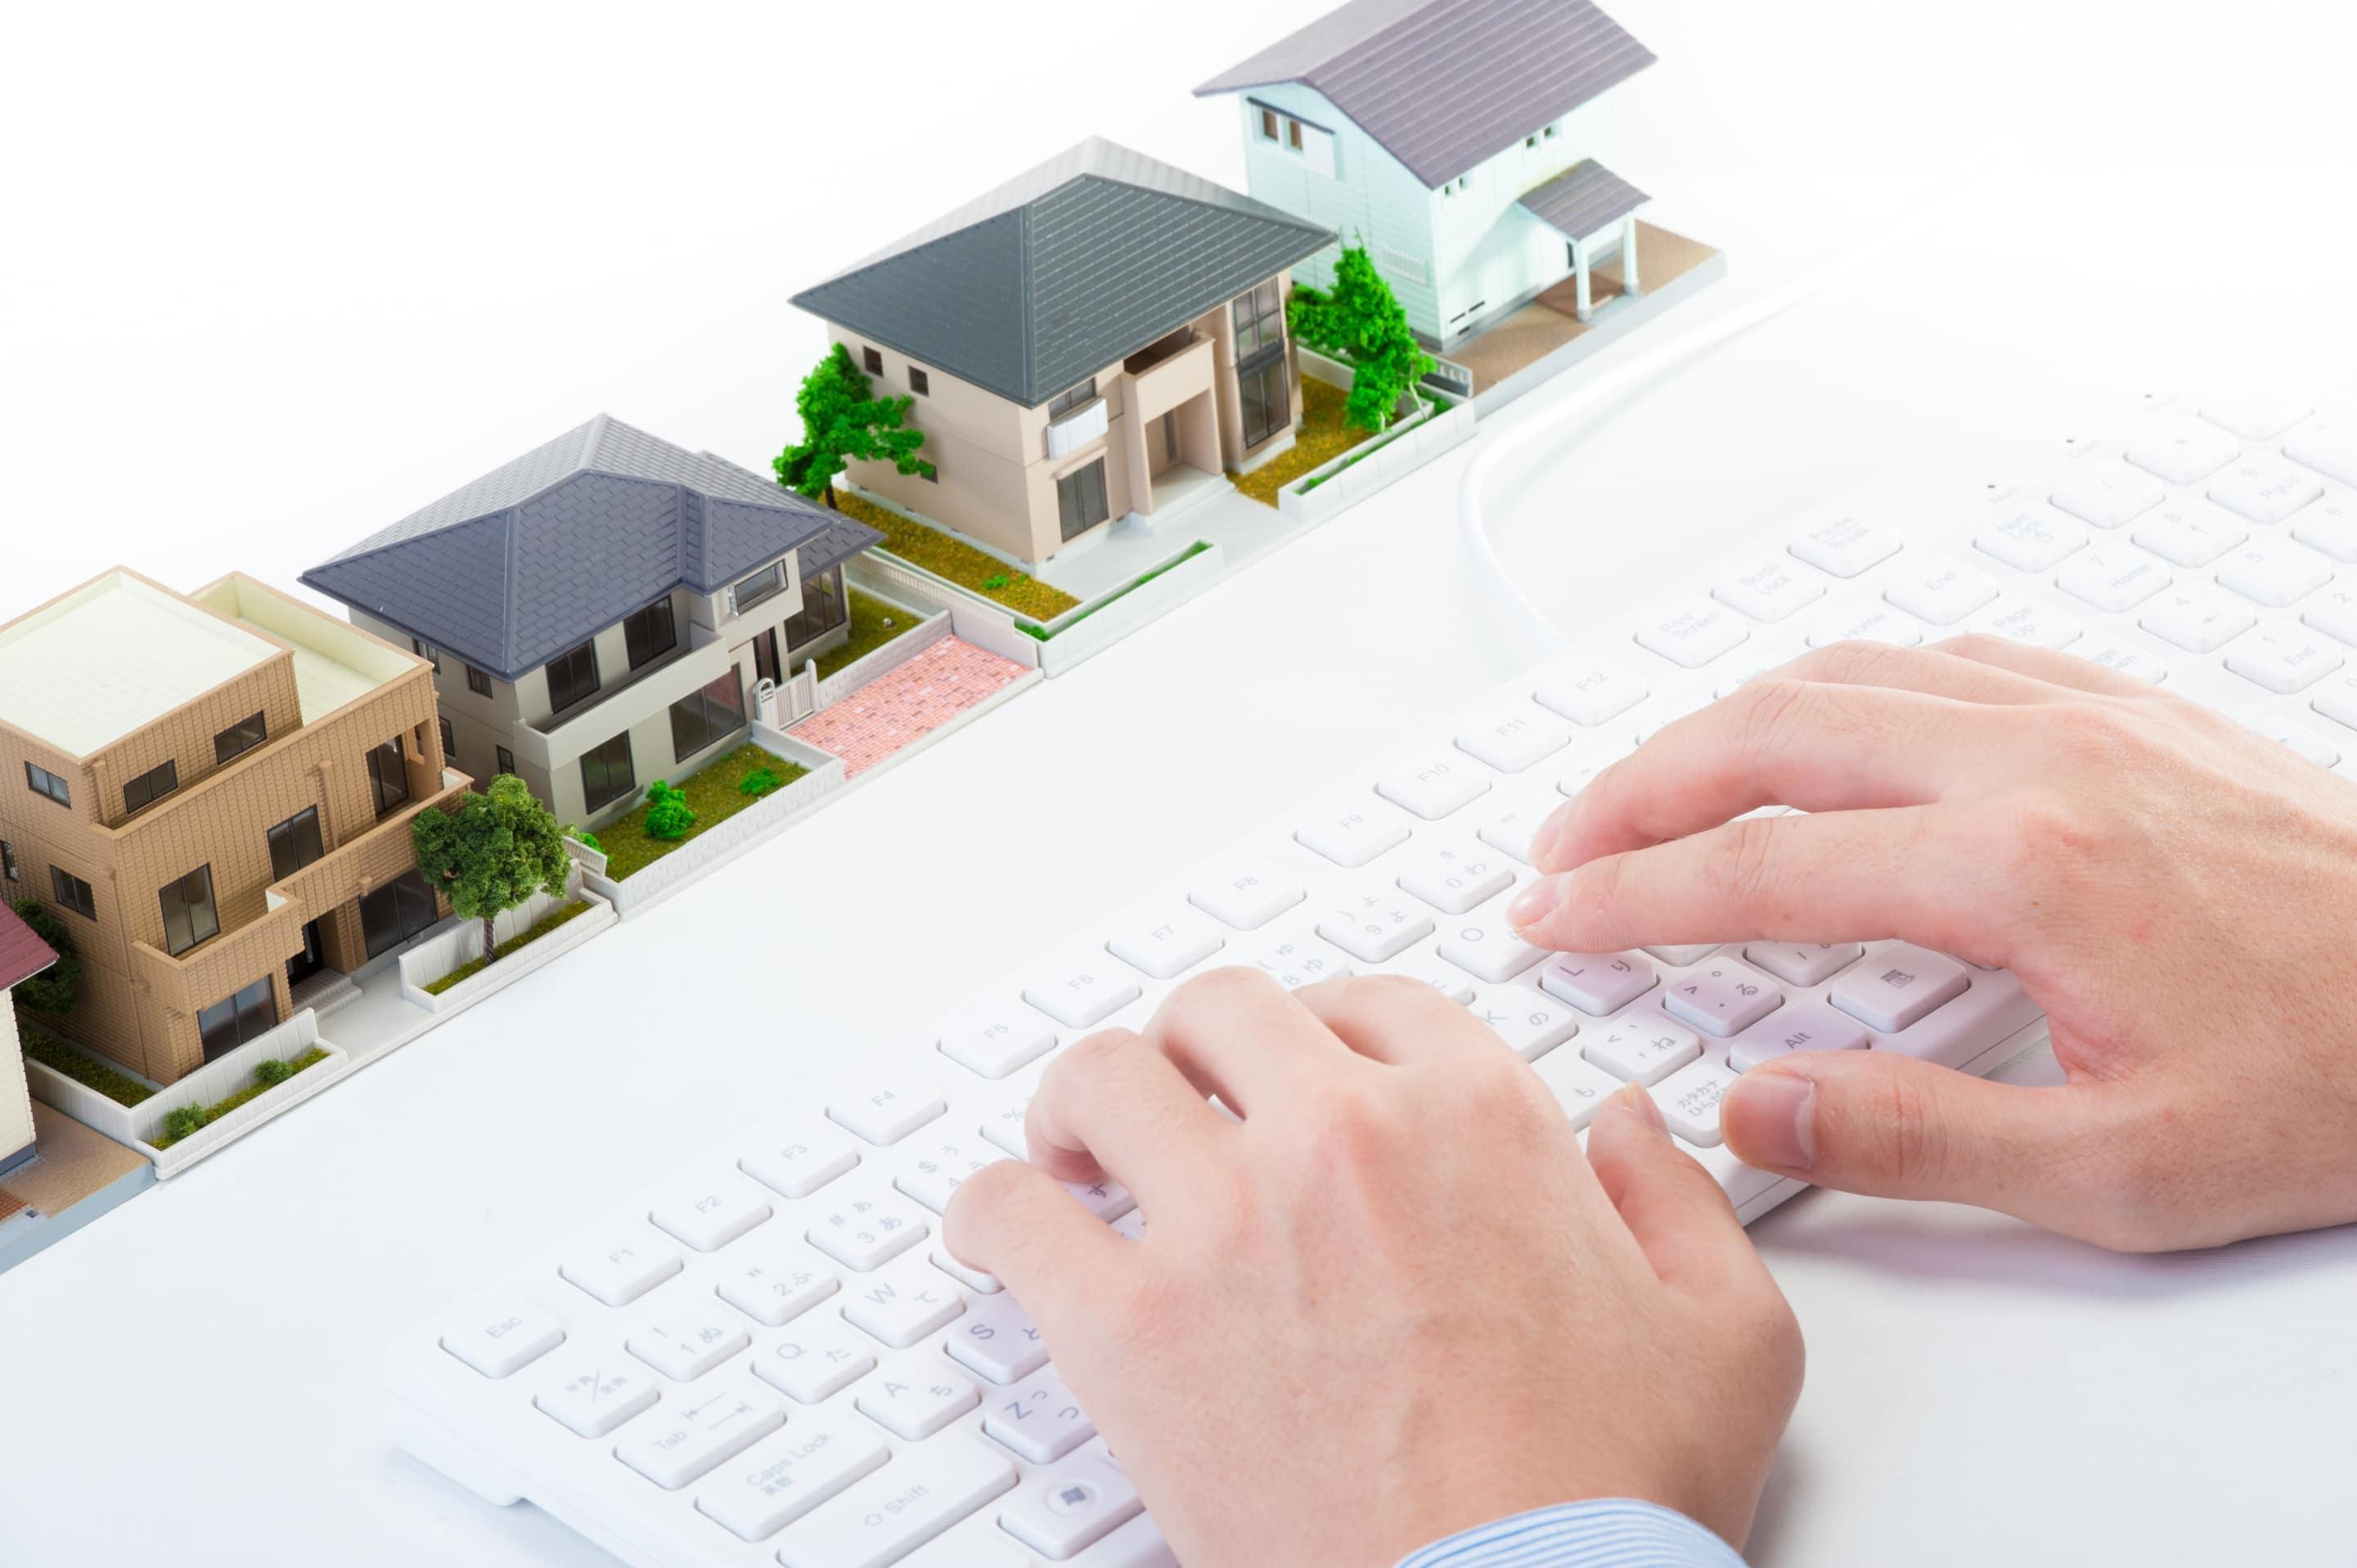 comment estimer son logement avec patrim. Black Bedroom Furniture Sets. Home Design Ideas